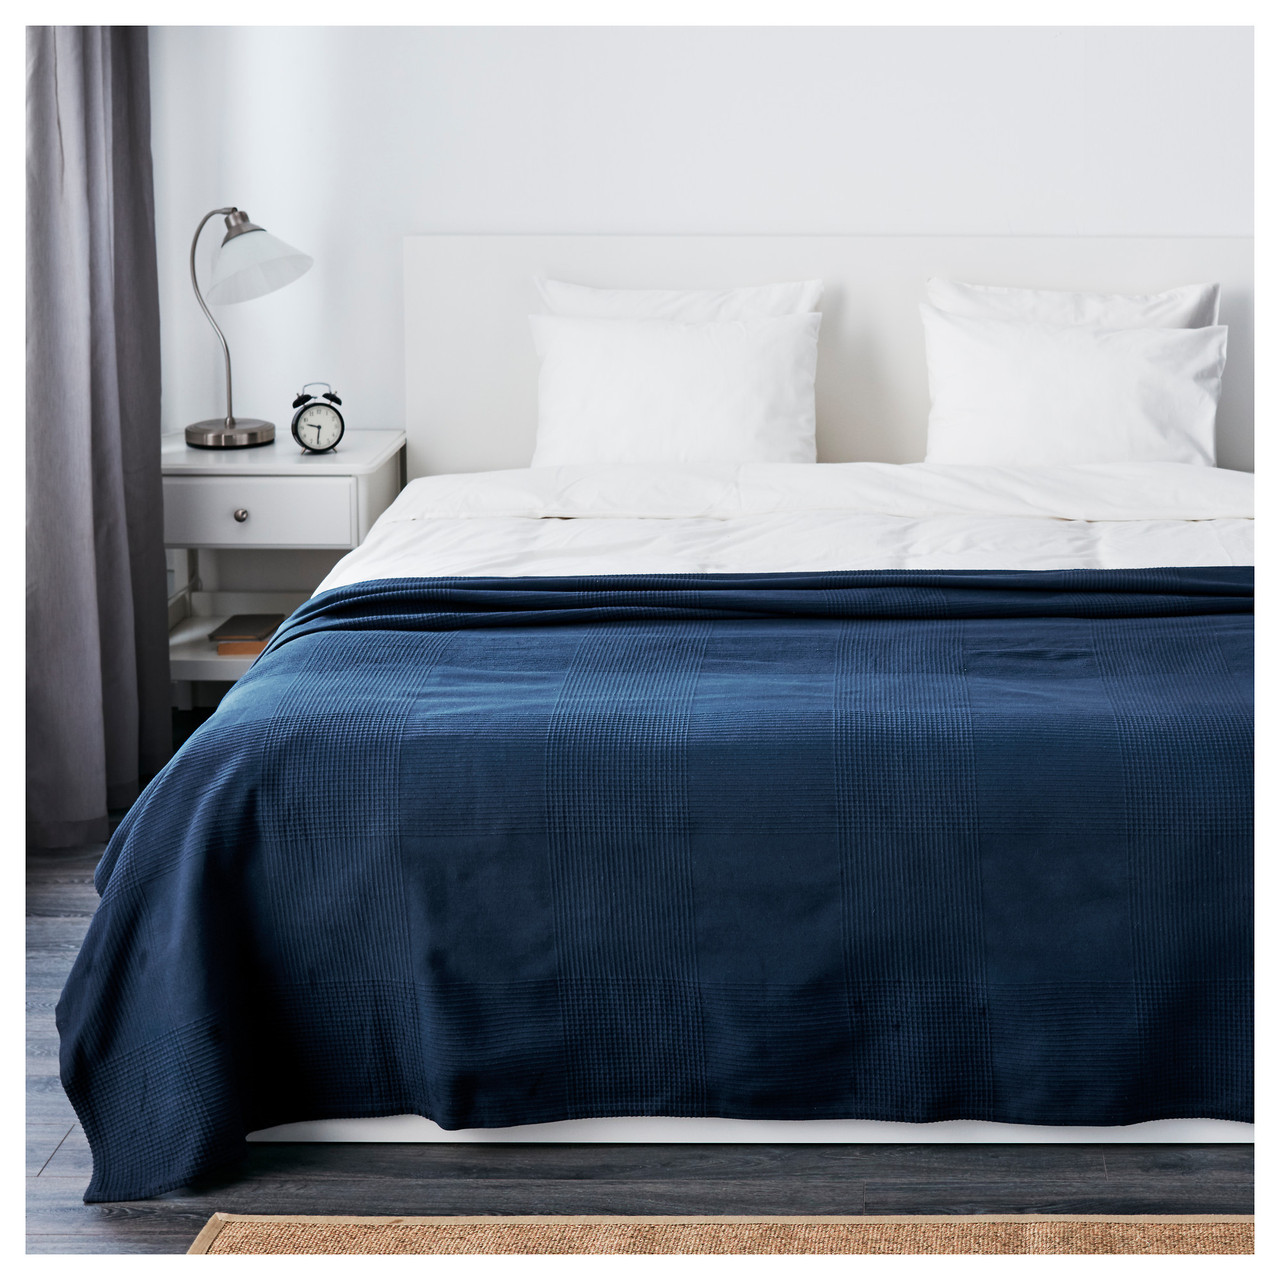 ИНДИРА Покрывало, темно-синий, 250x230 см 10396246 ИКЕА, IKEA, INDIRA